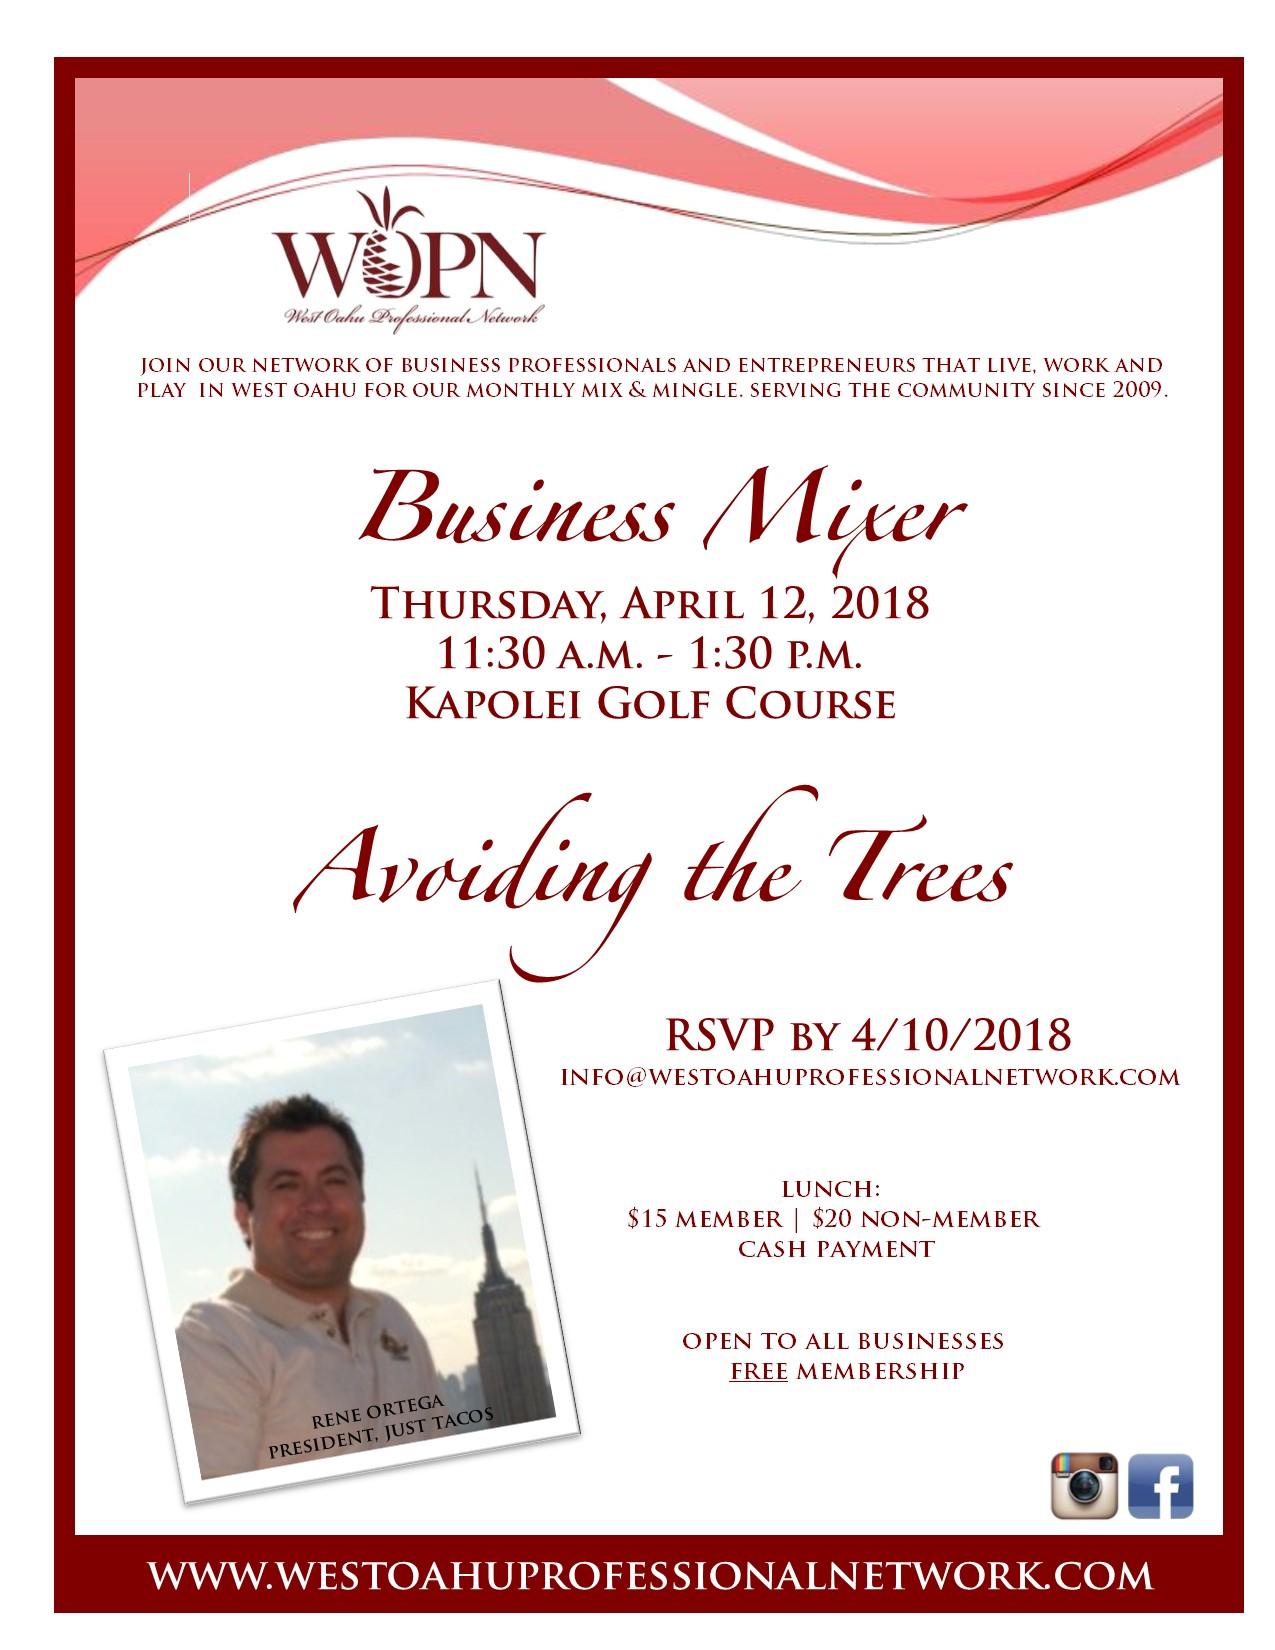 WOPN Business Mixer - April 12, 2018